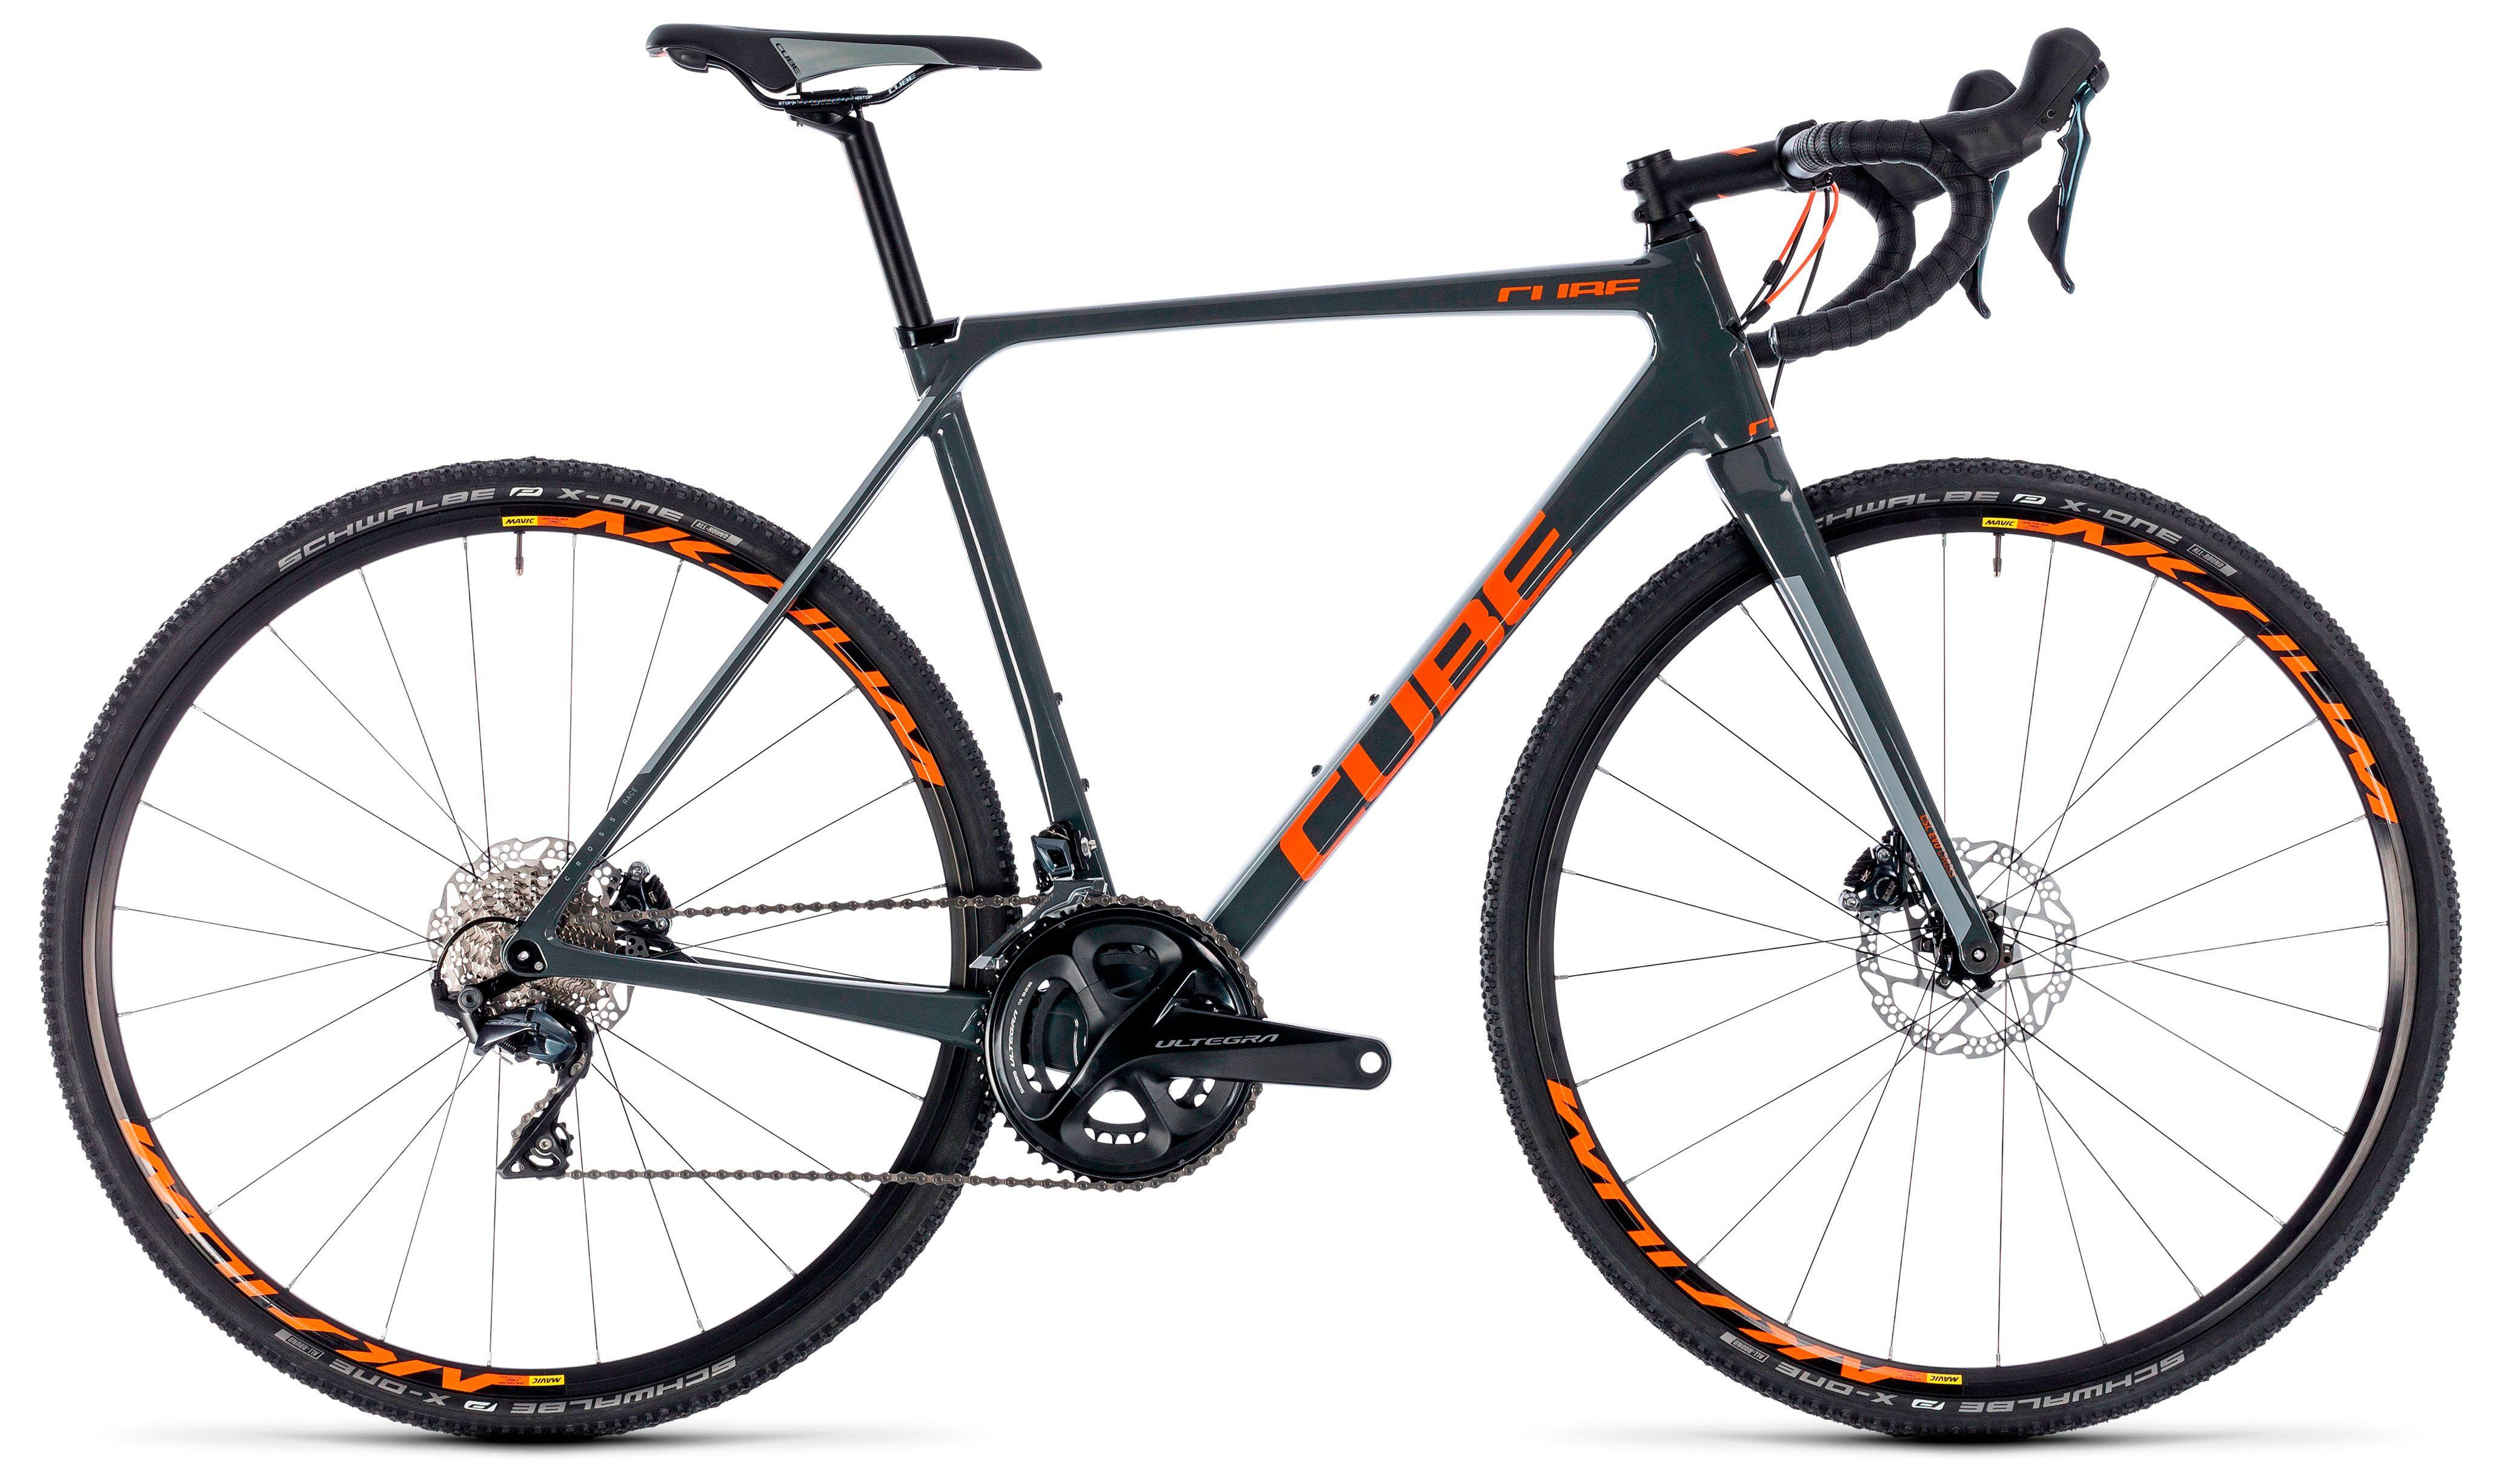 Велосипед Cube Cross Race C:62 Pro 2018 велосипед cube sl road race 2018